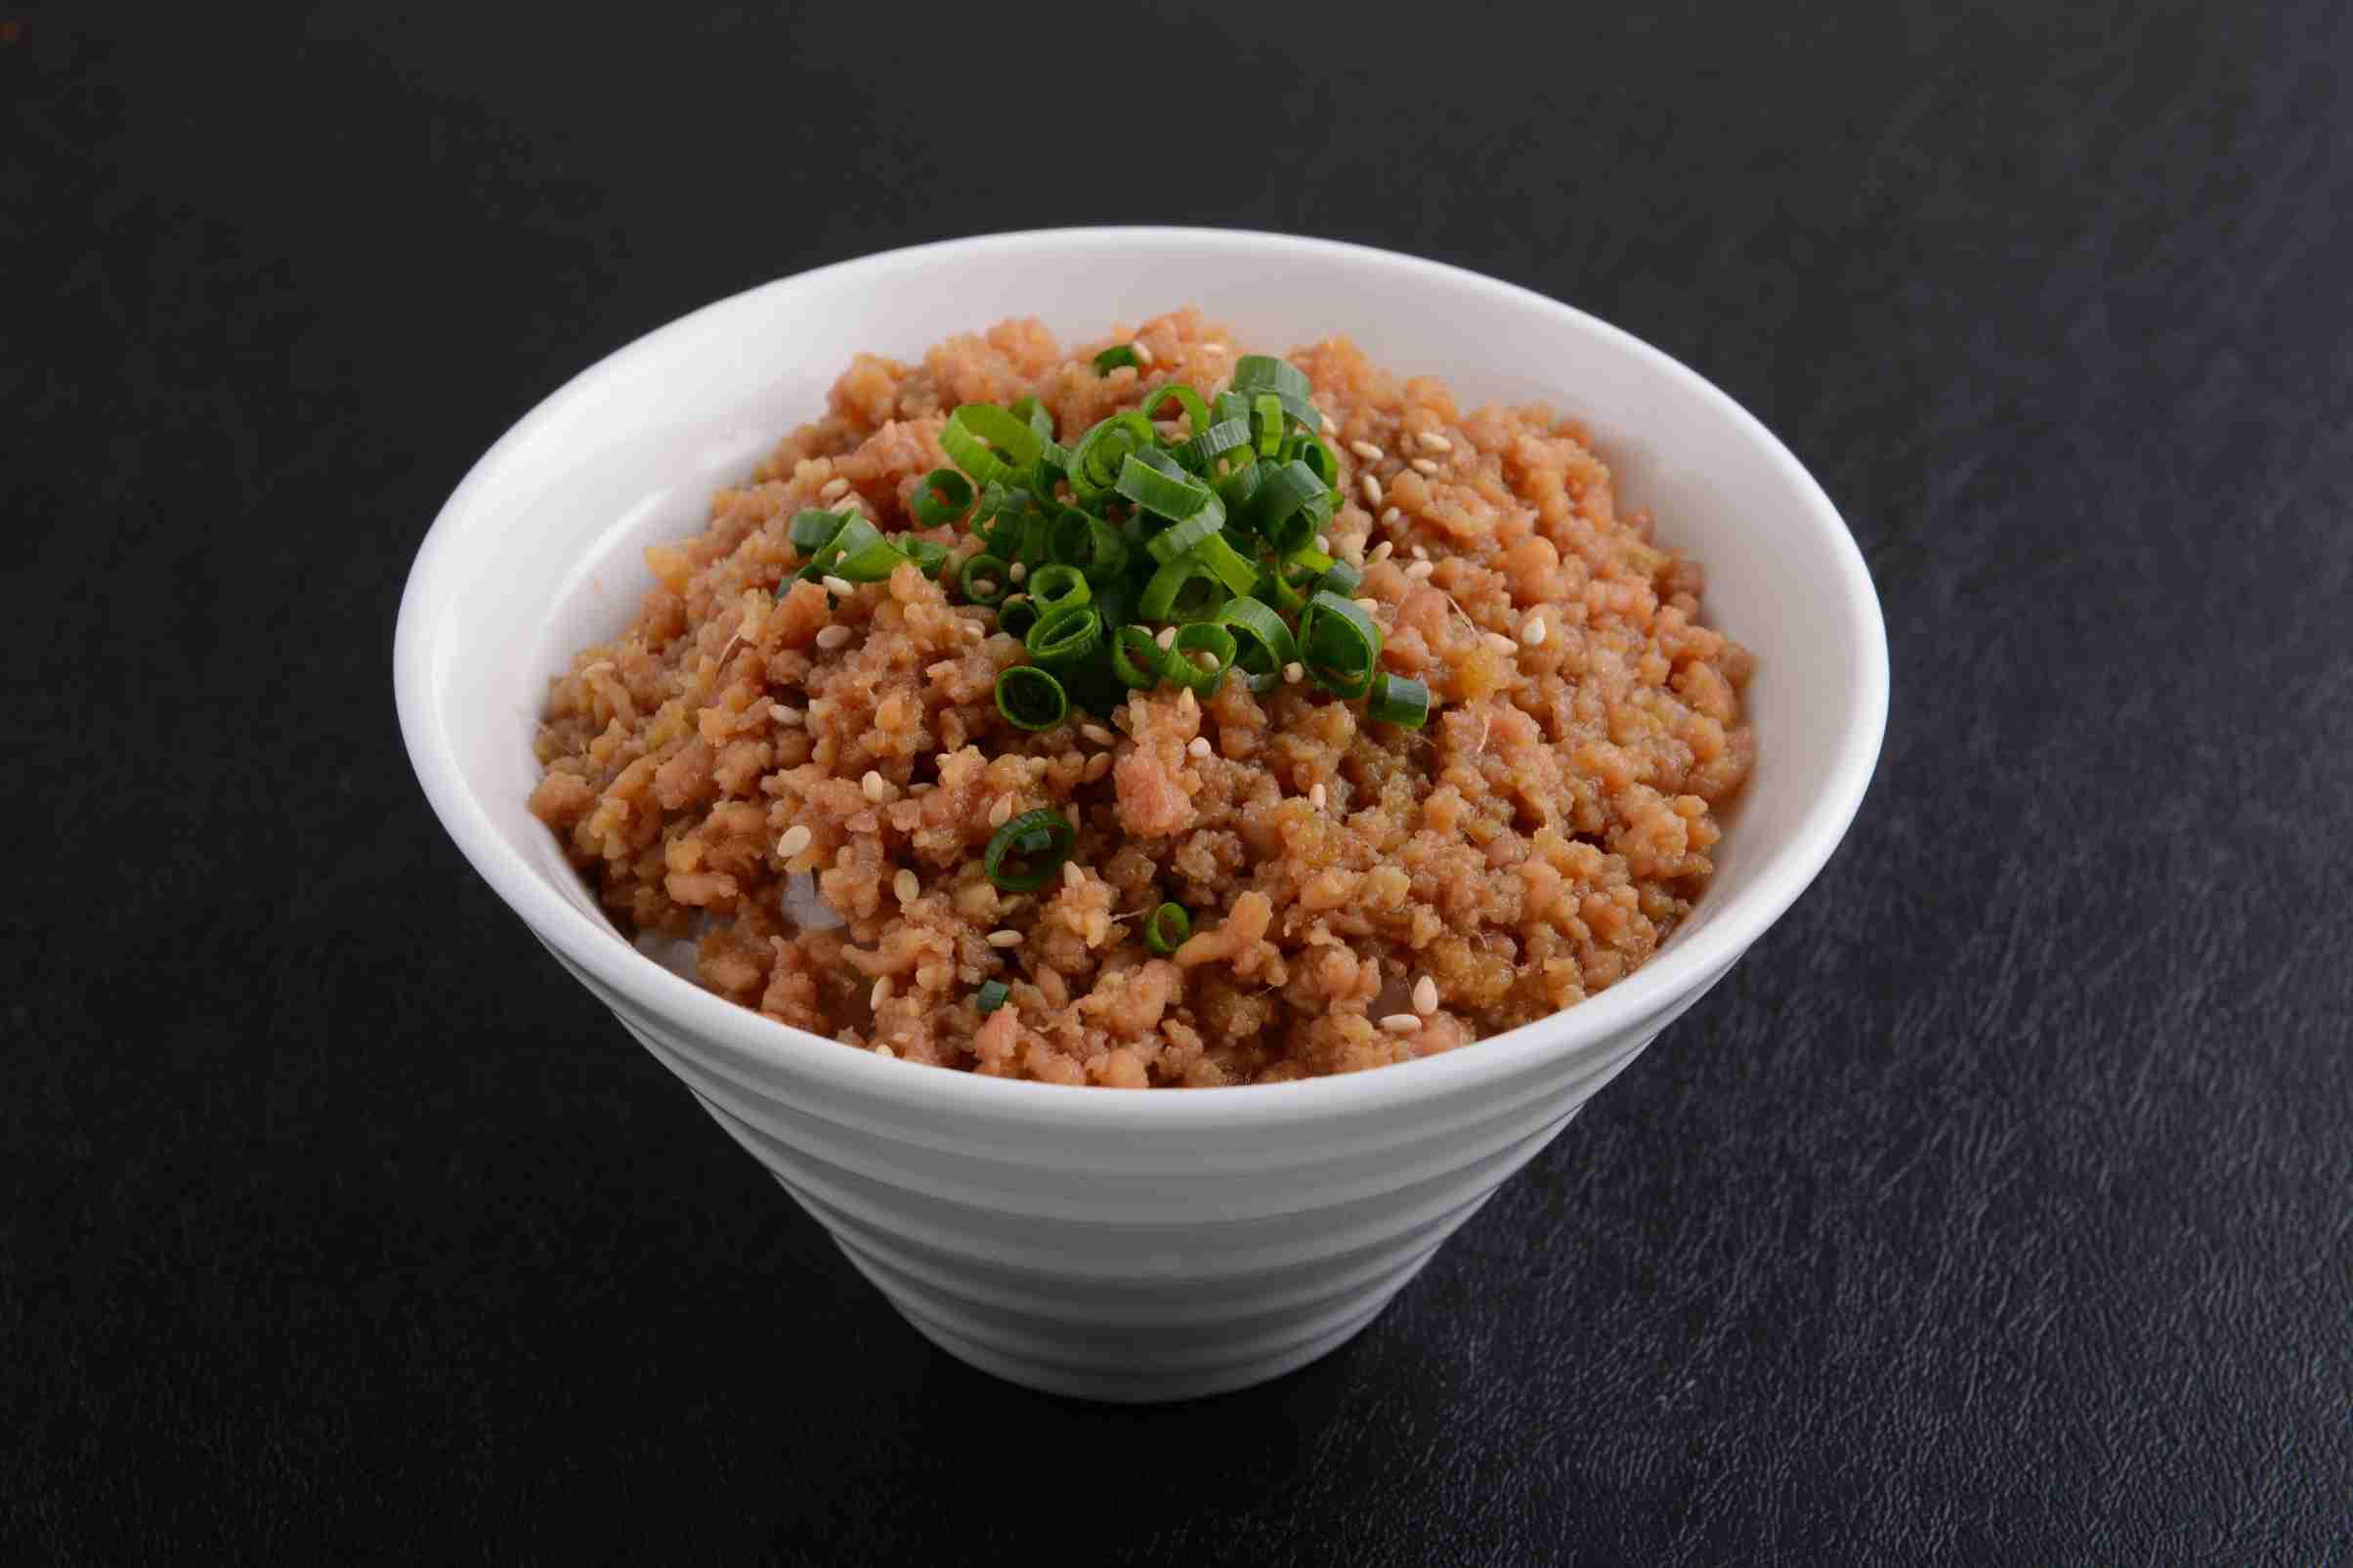 SOBORO MESHI (Minced Chicken on Rice) ($5.50)